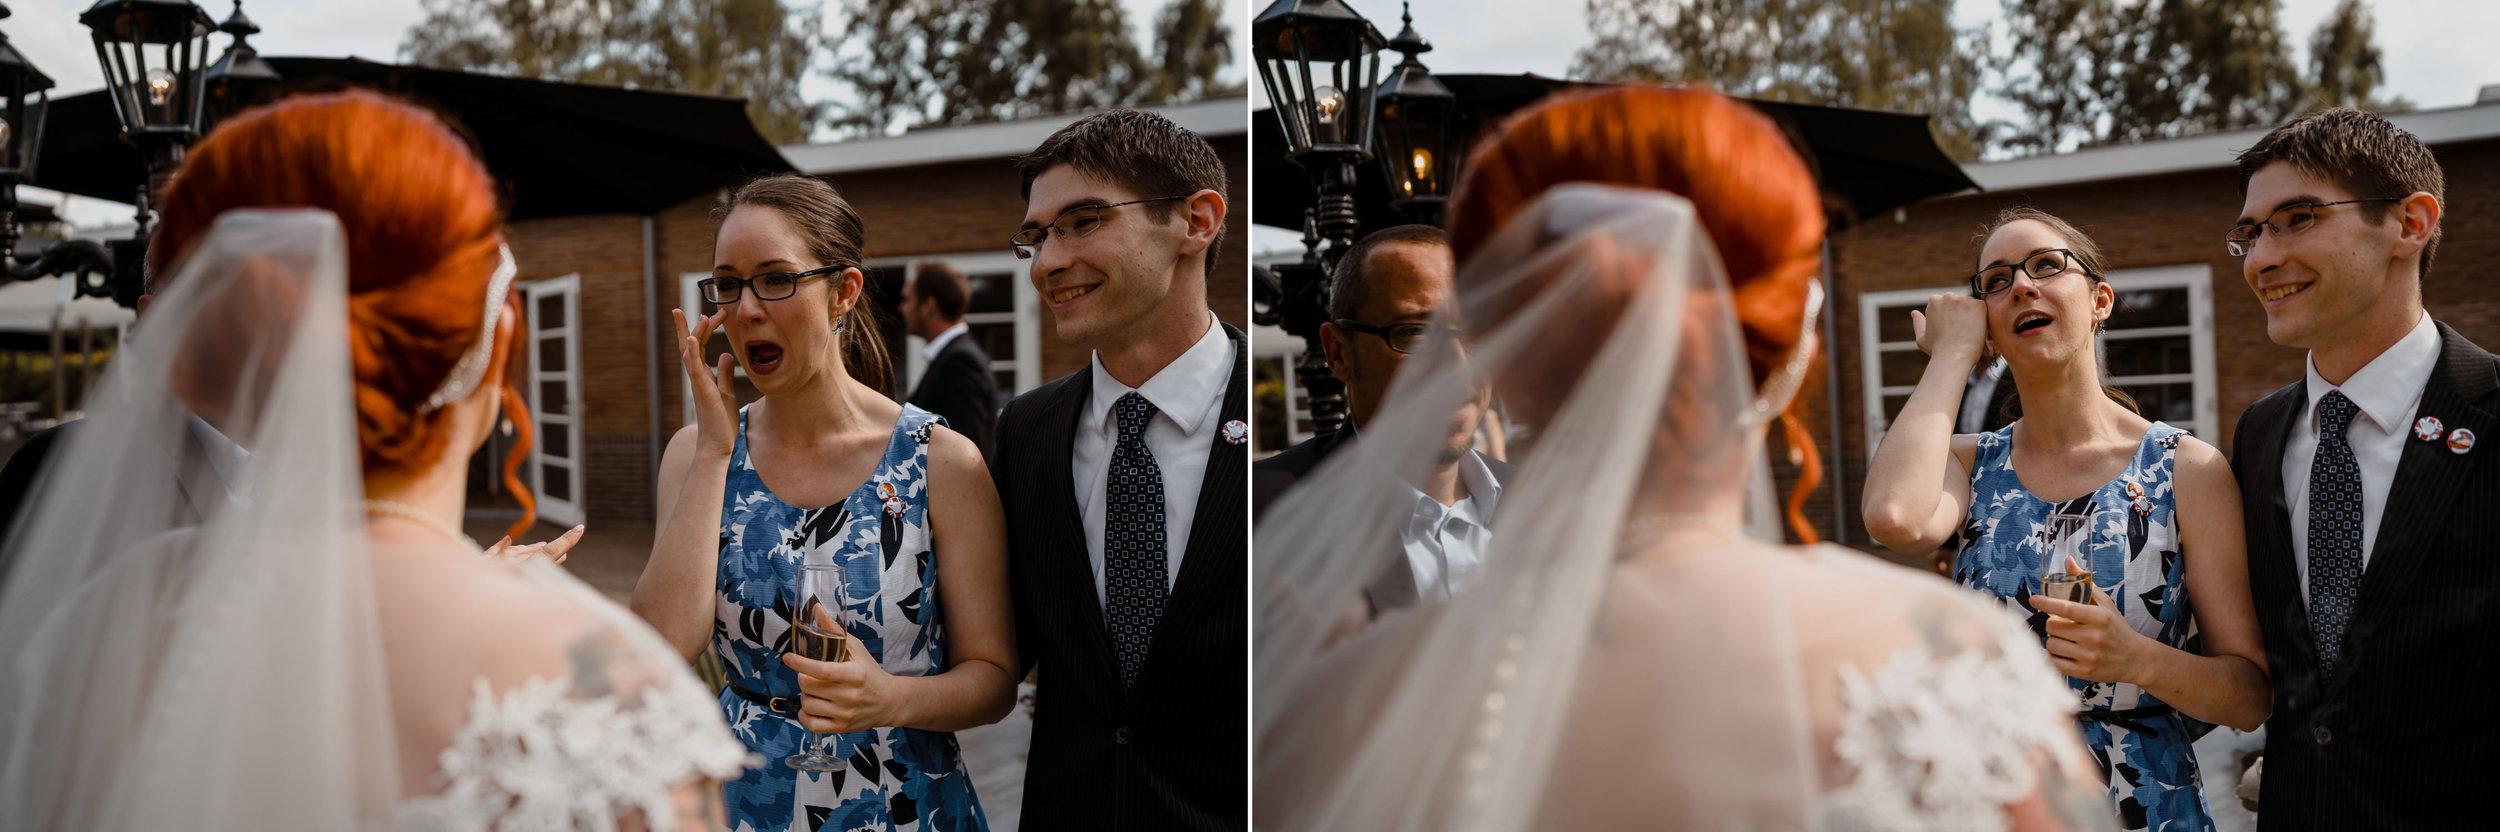 amsterdam-wedding-photographer-bruidsfotografie-trouwfotograaf-mark-hadden-Lucie-Luuk-244 copy.jpg